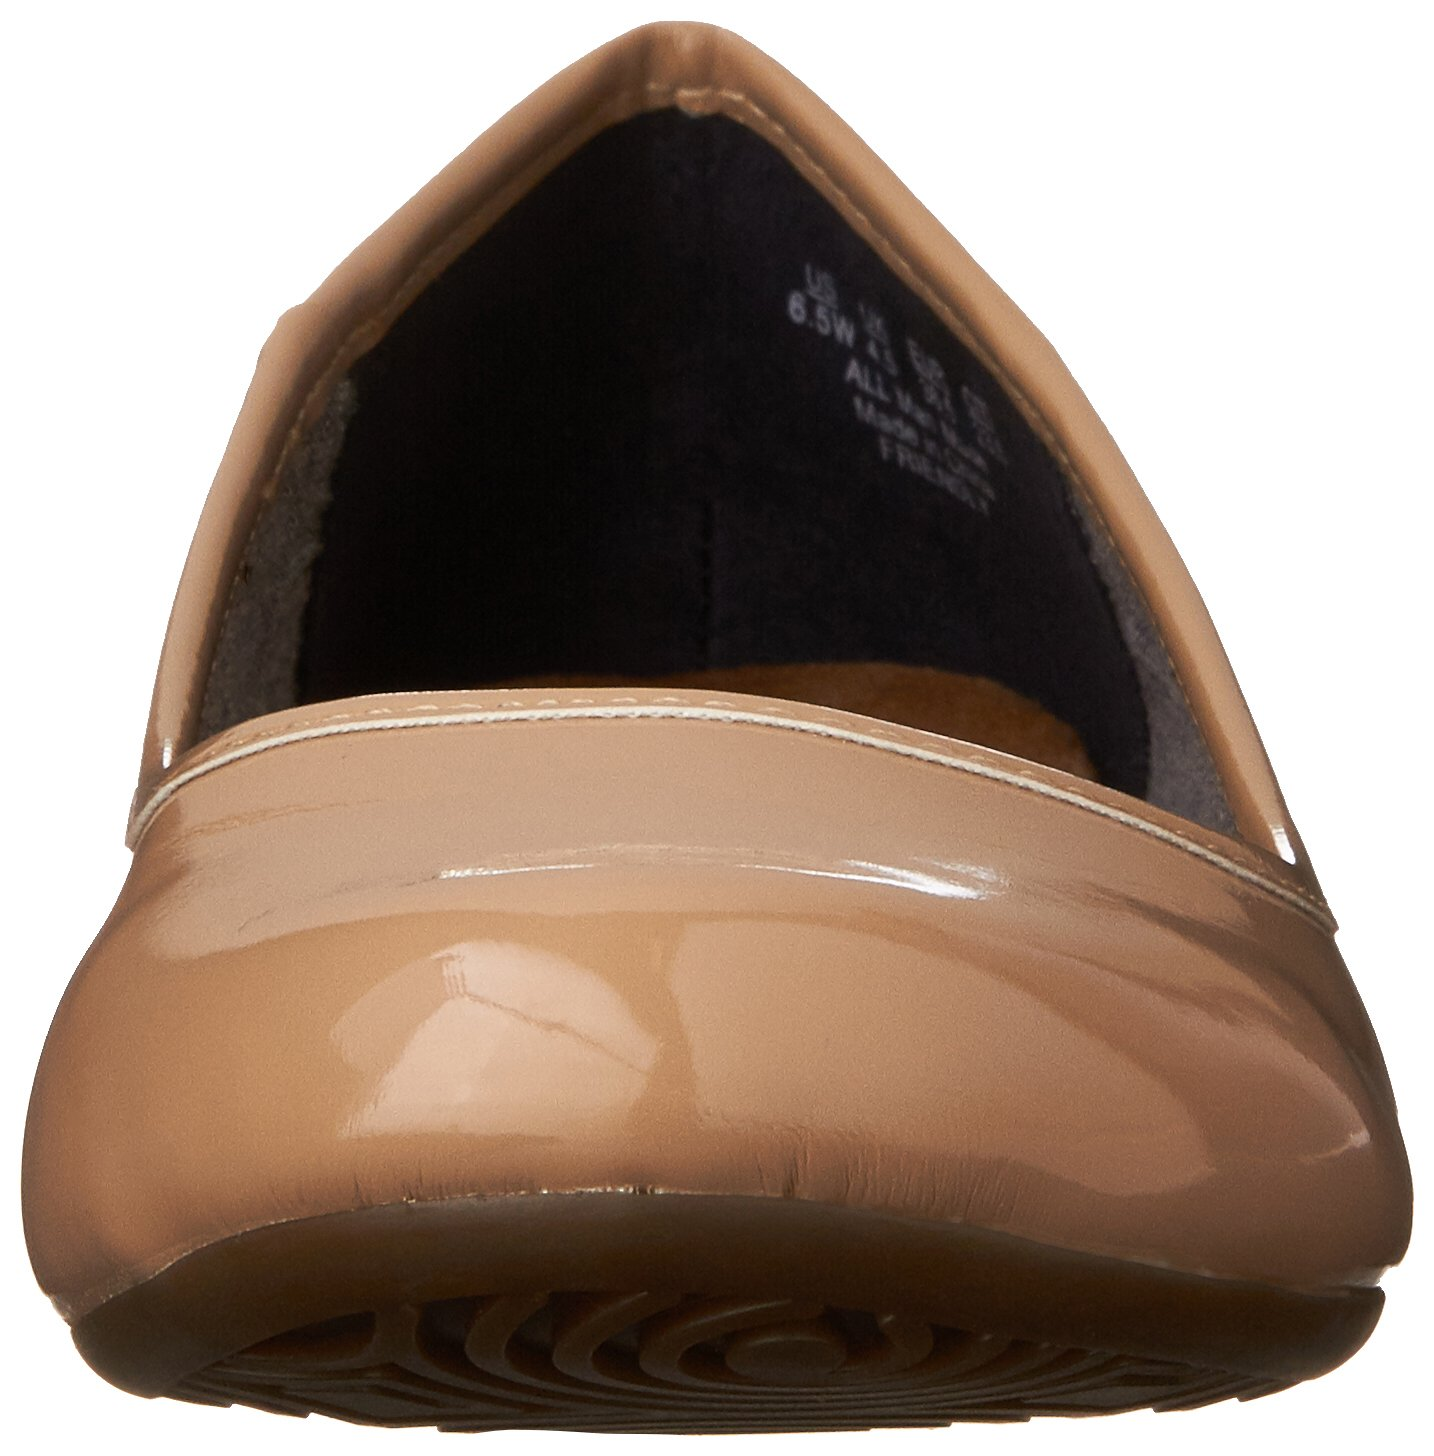 Dr. Scholl's Women's Friendly US|Sand Ballet Flat B00J09XH70 6.5 W US|Sand Friendly Patent 75239c